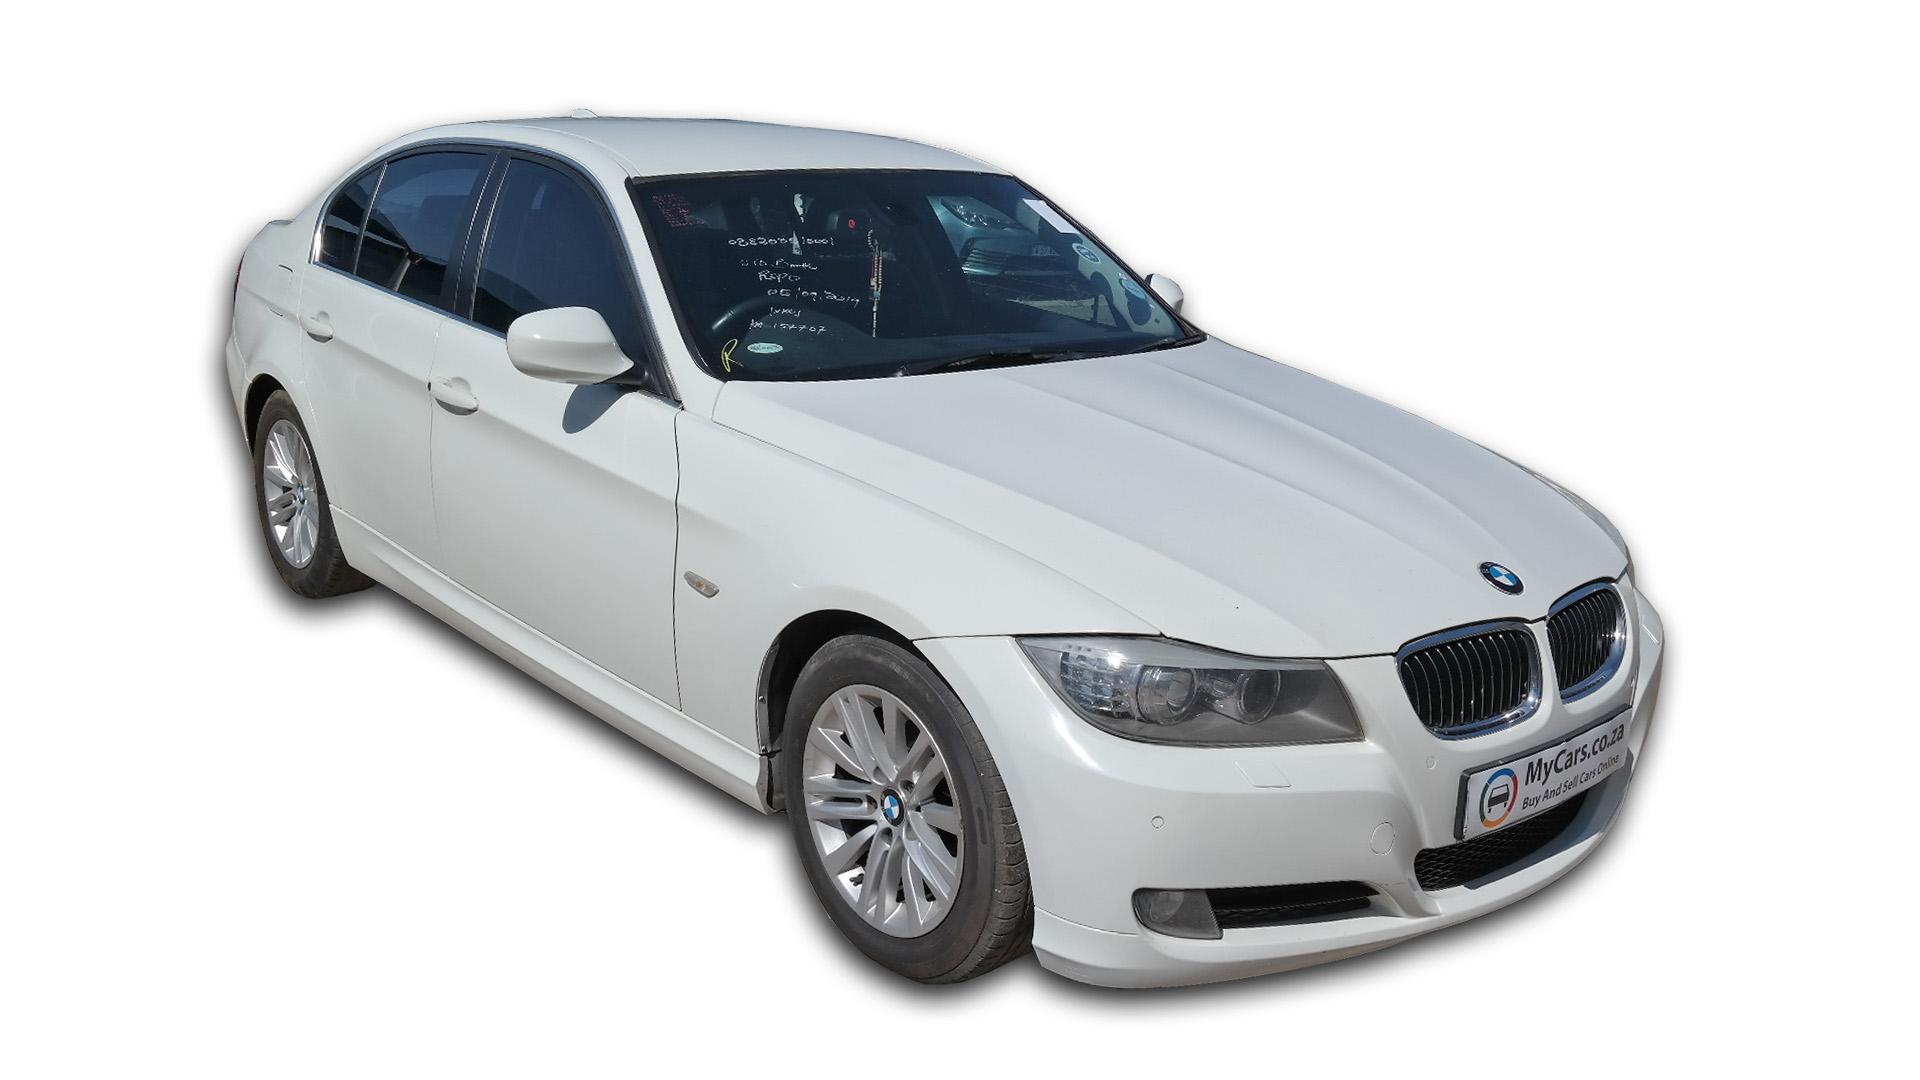 BMW 3 Series 323I (E90) Exclusive